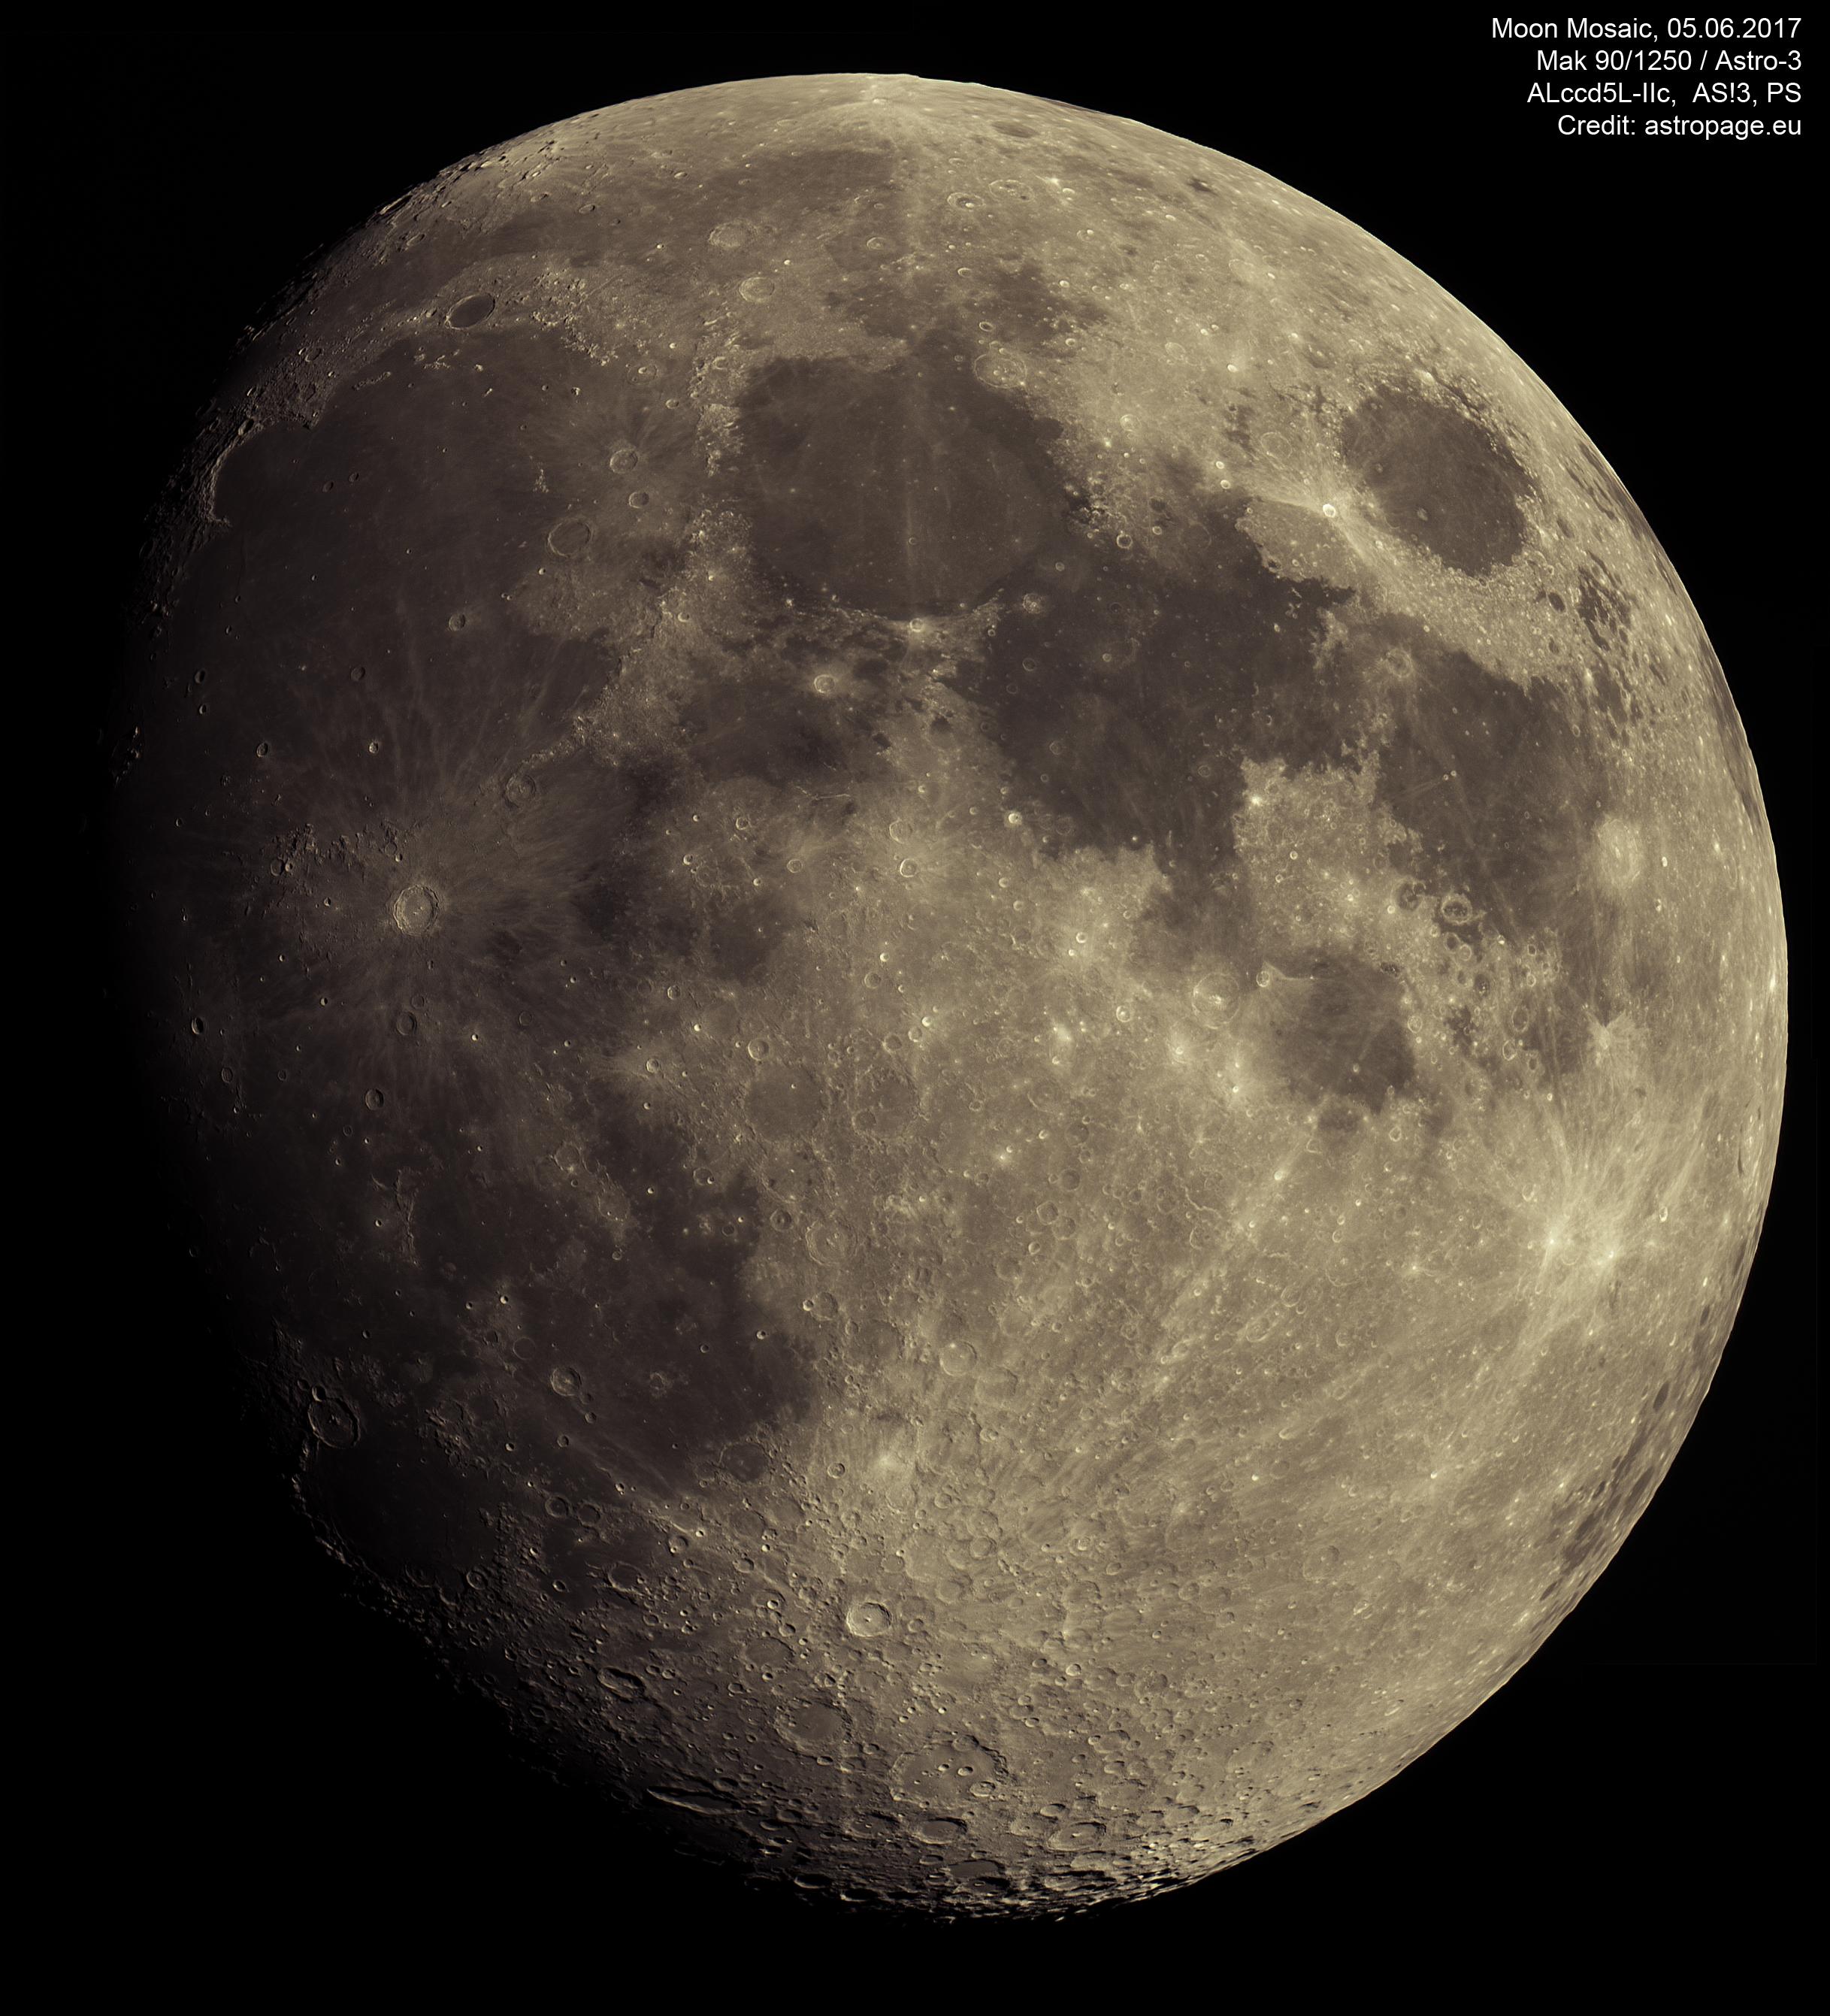 Mond-Mosaik vom 5. Juni 2017. (Credit: astropage.eu)